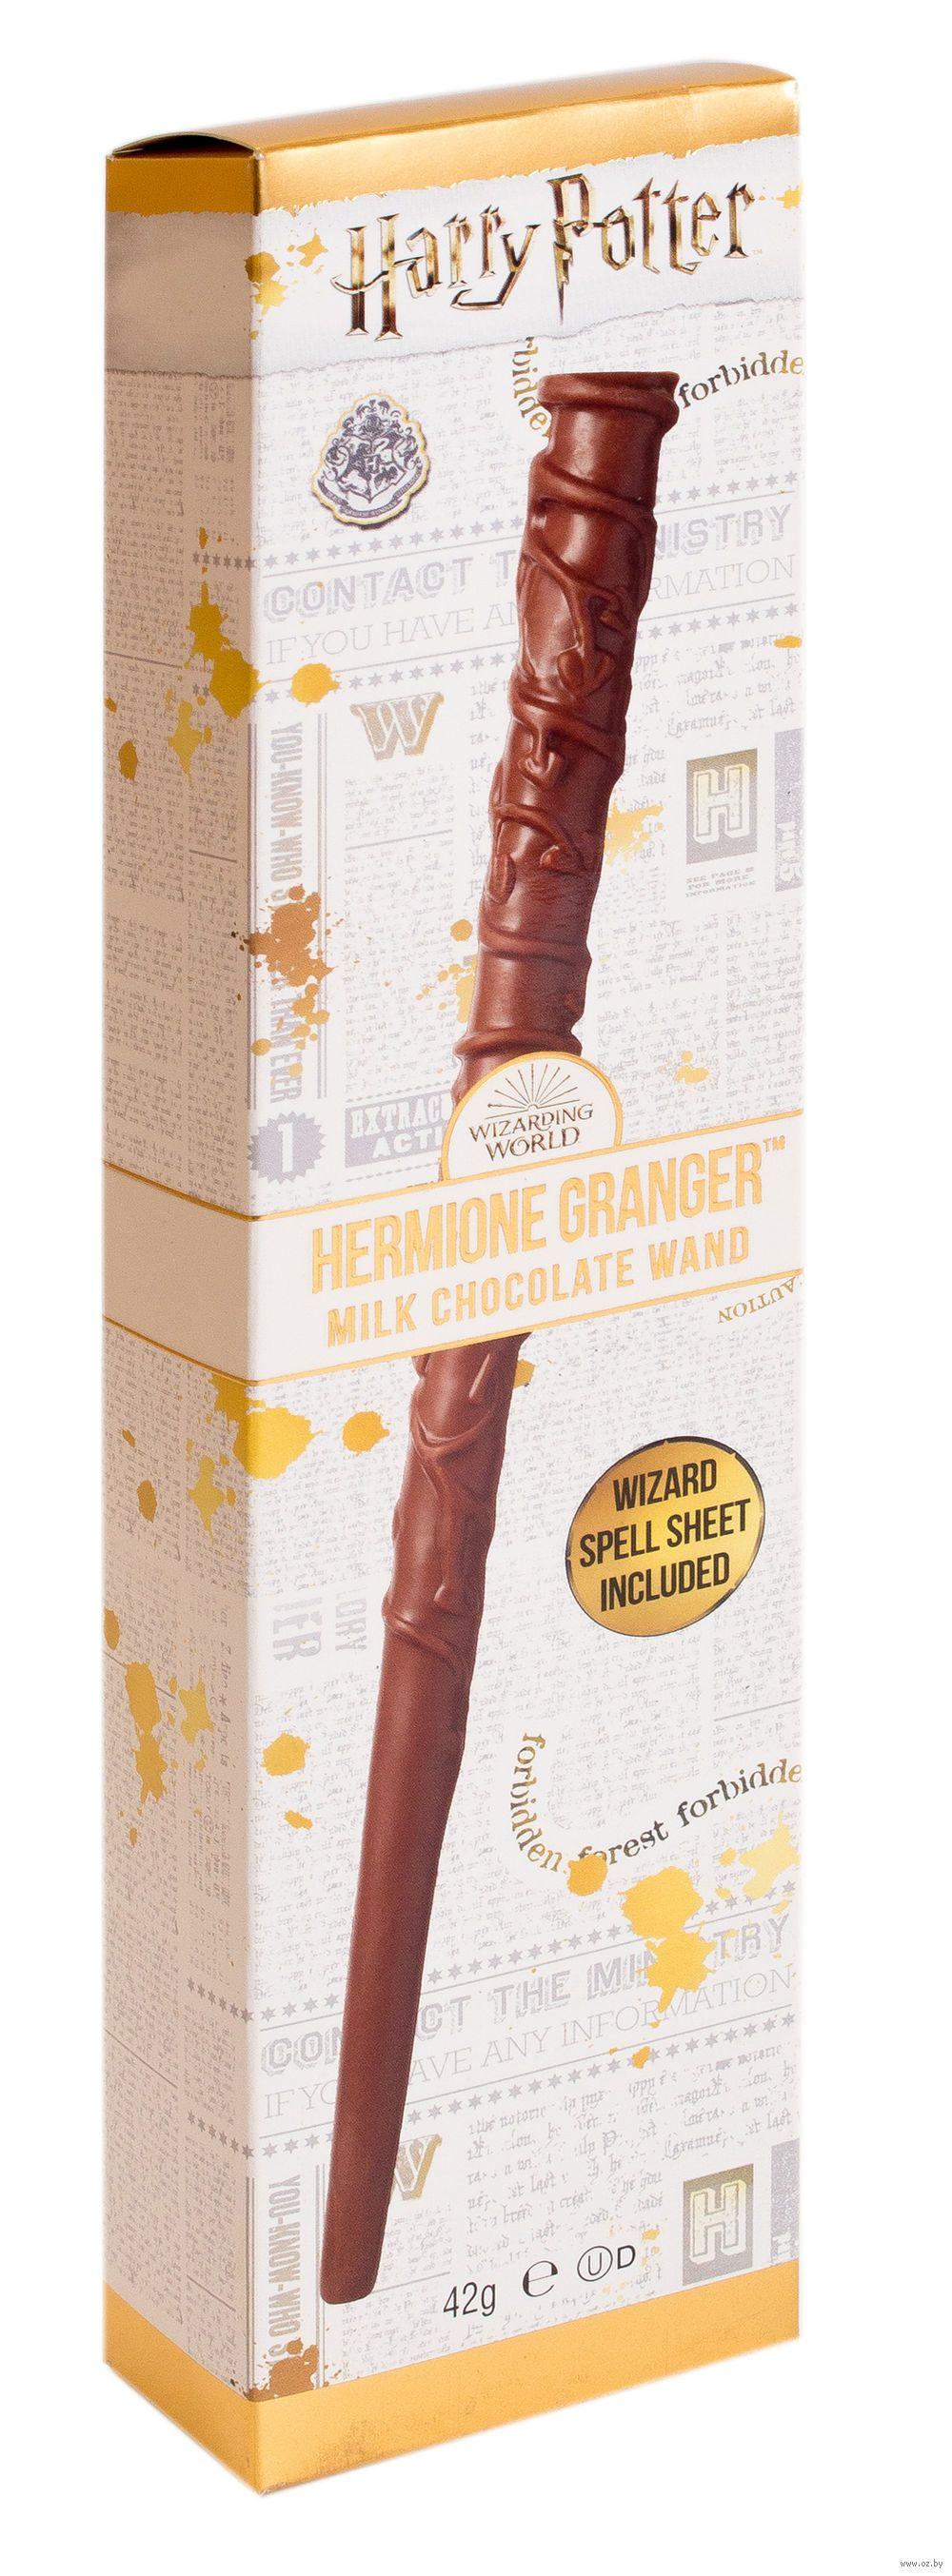 "Jelly Belly Magic Wand Шоколад молочный ""Волшебная палочка. Гермиона"" 42 г"